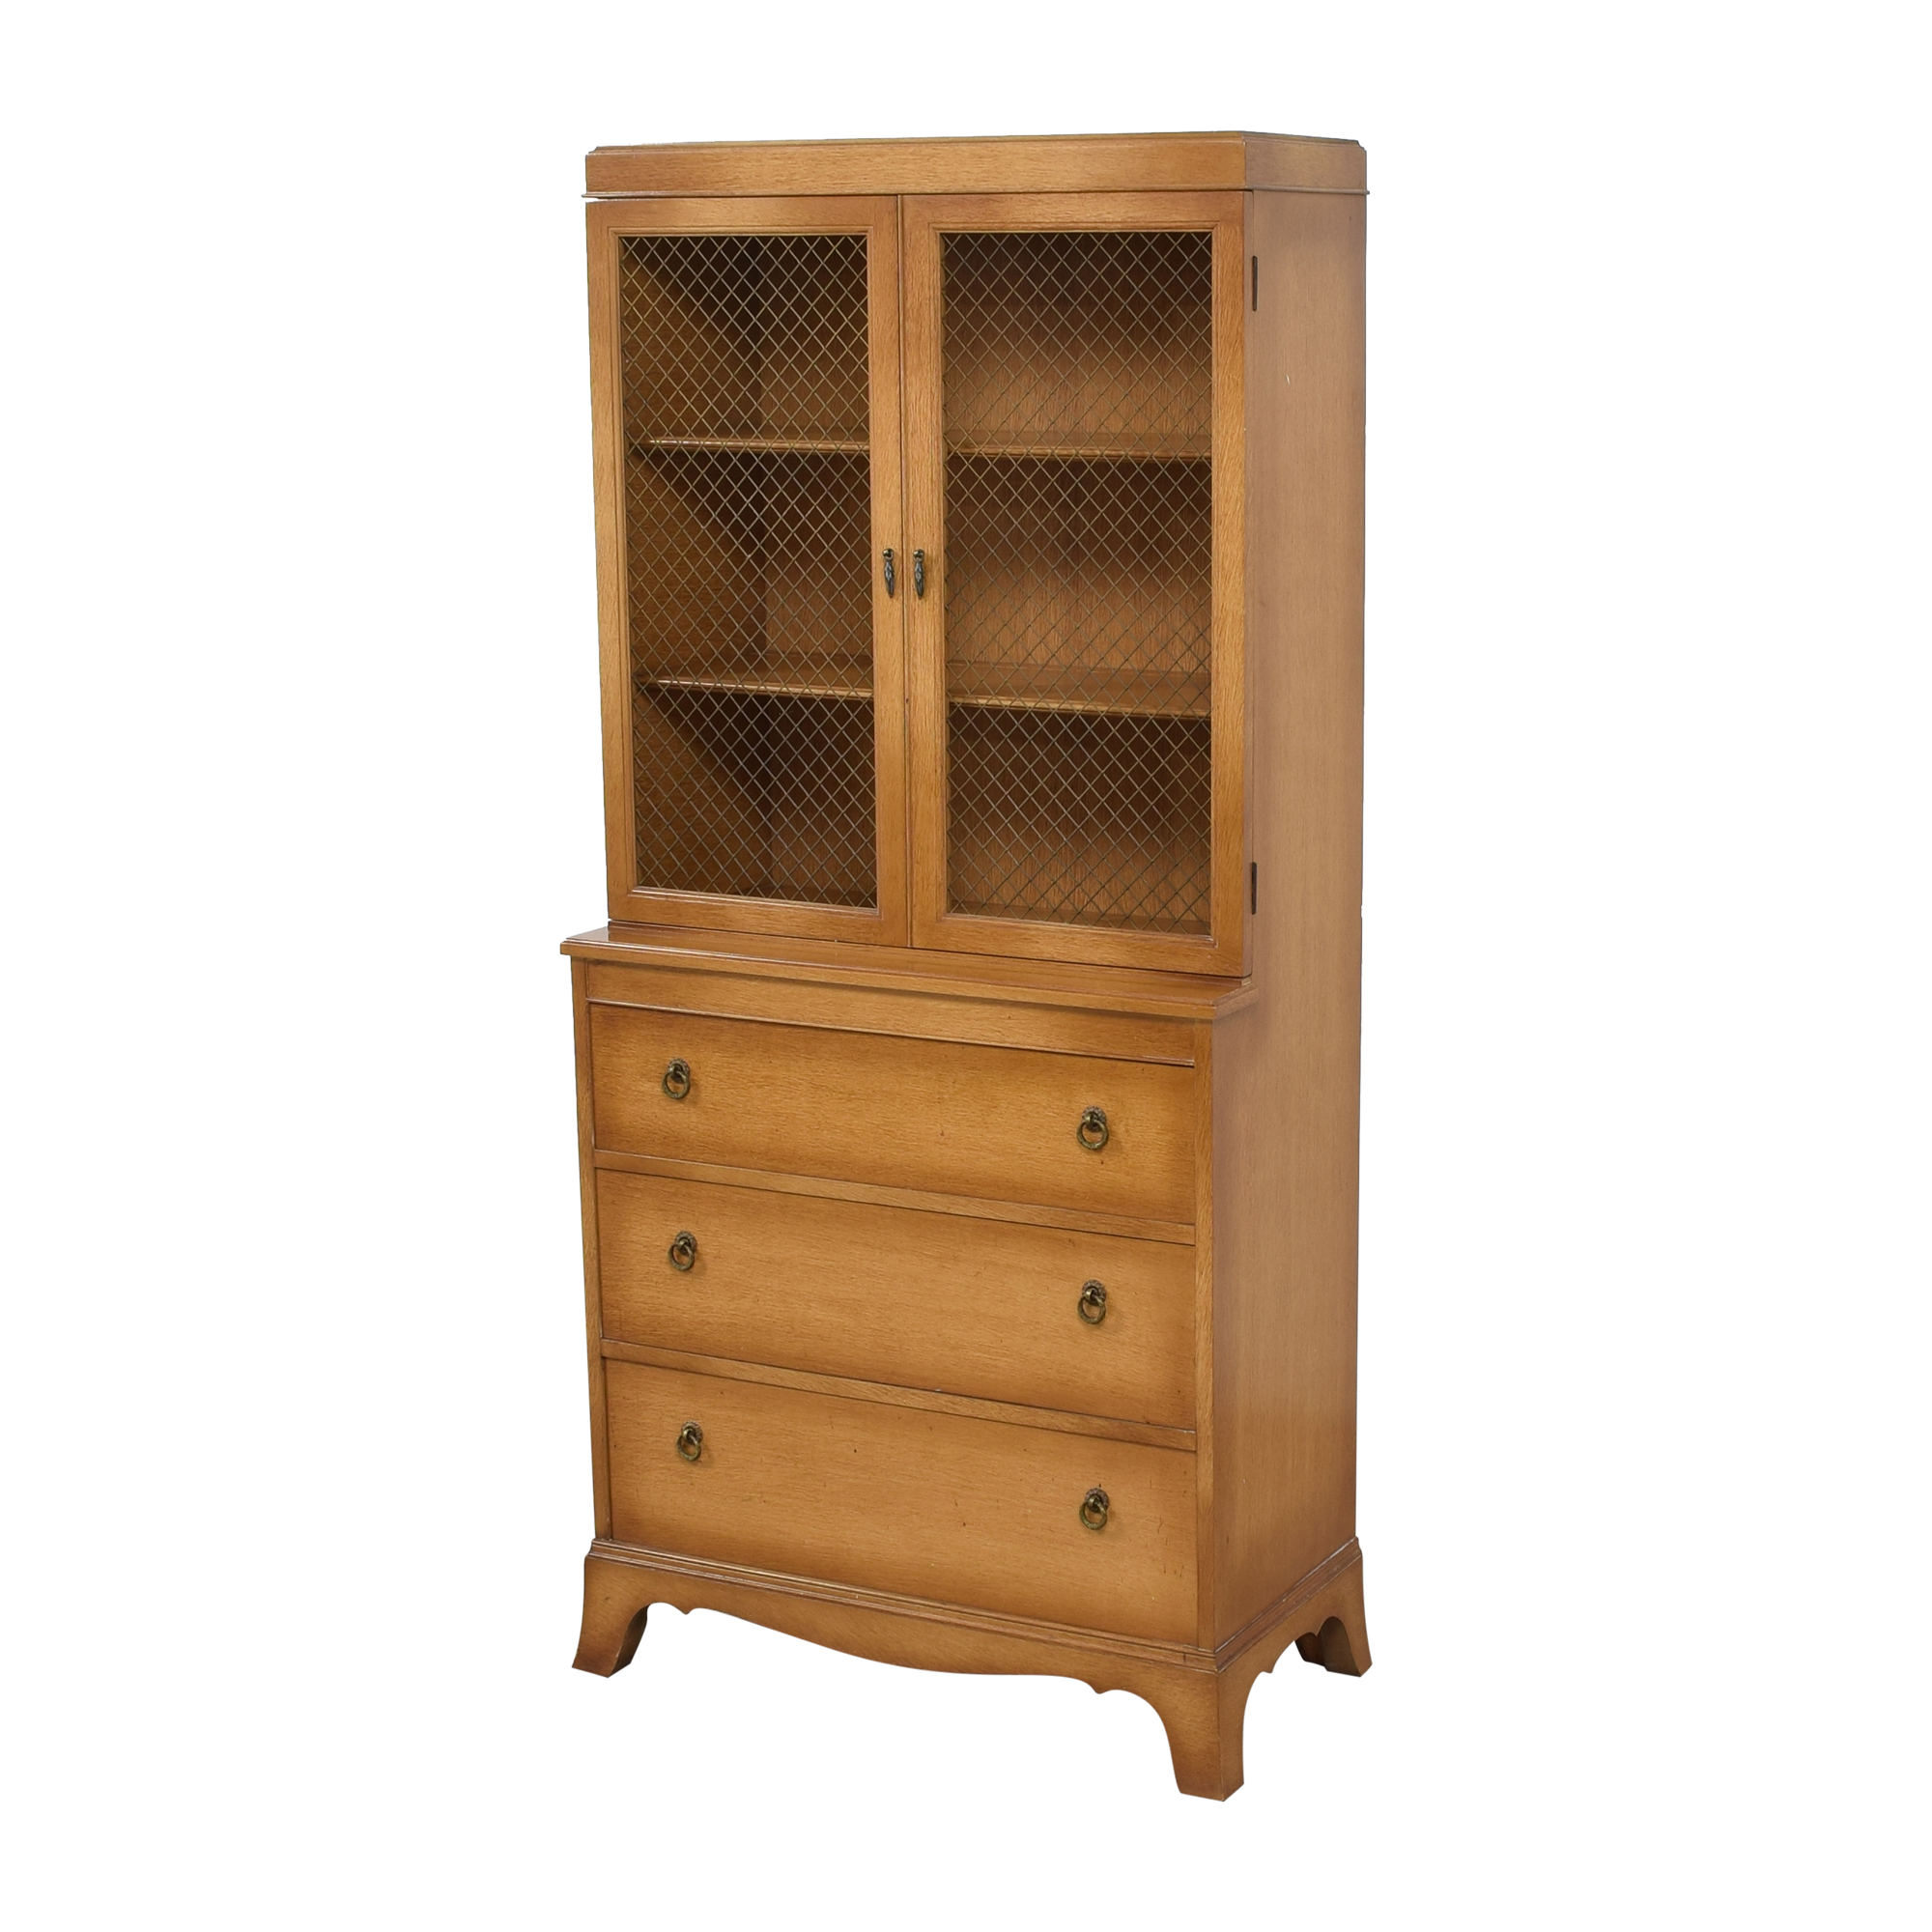 Three Drawer Dining Cabinet price